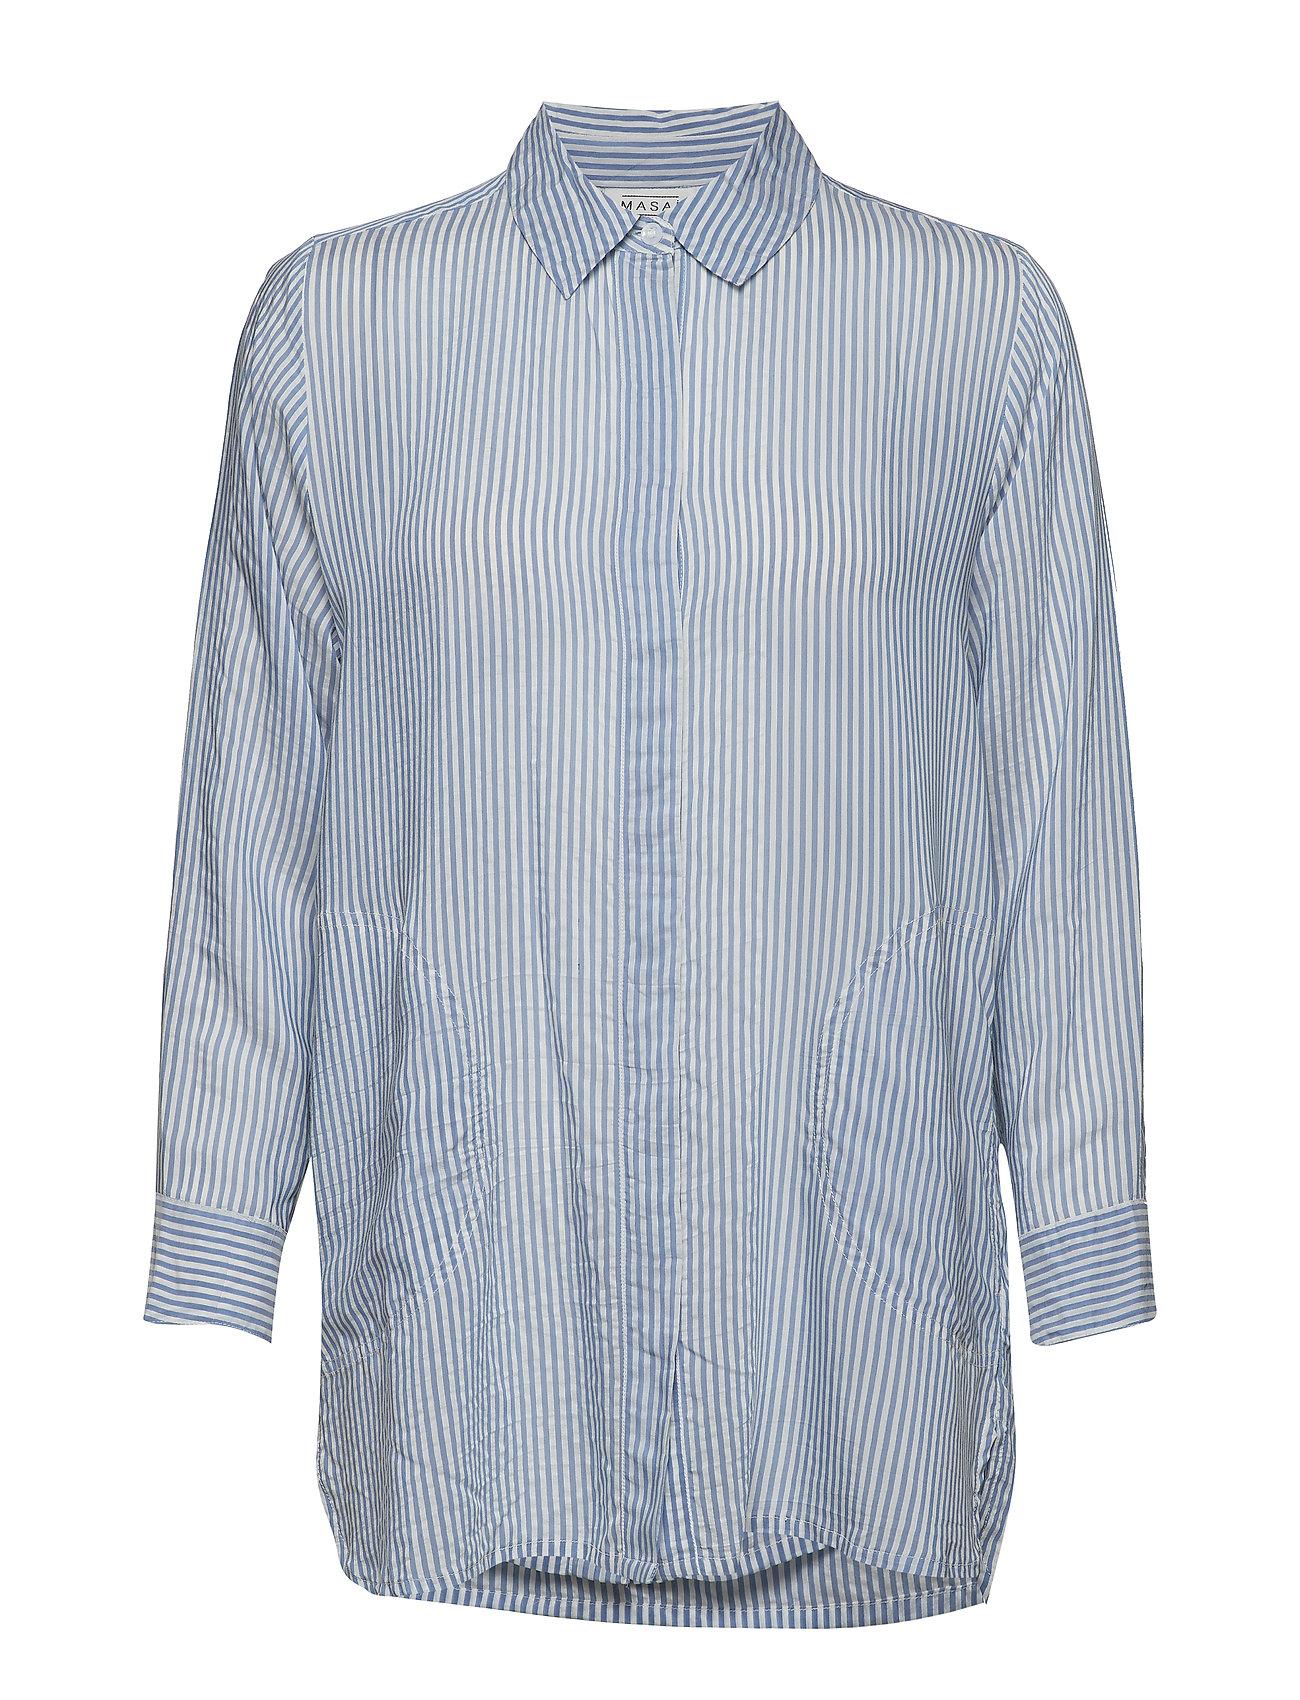 Masai Ibene blouse - PORCELA ORG